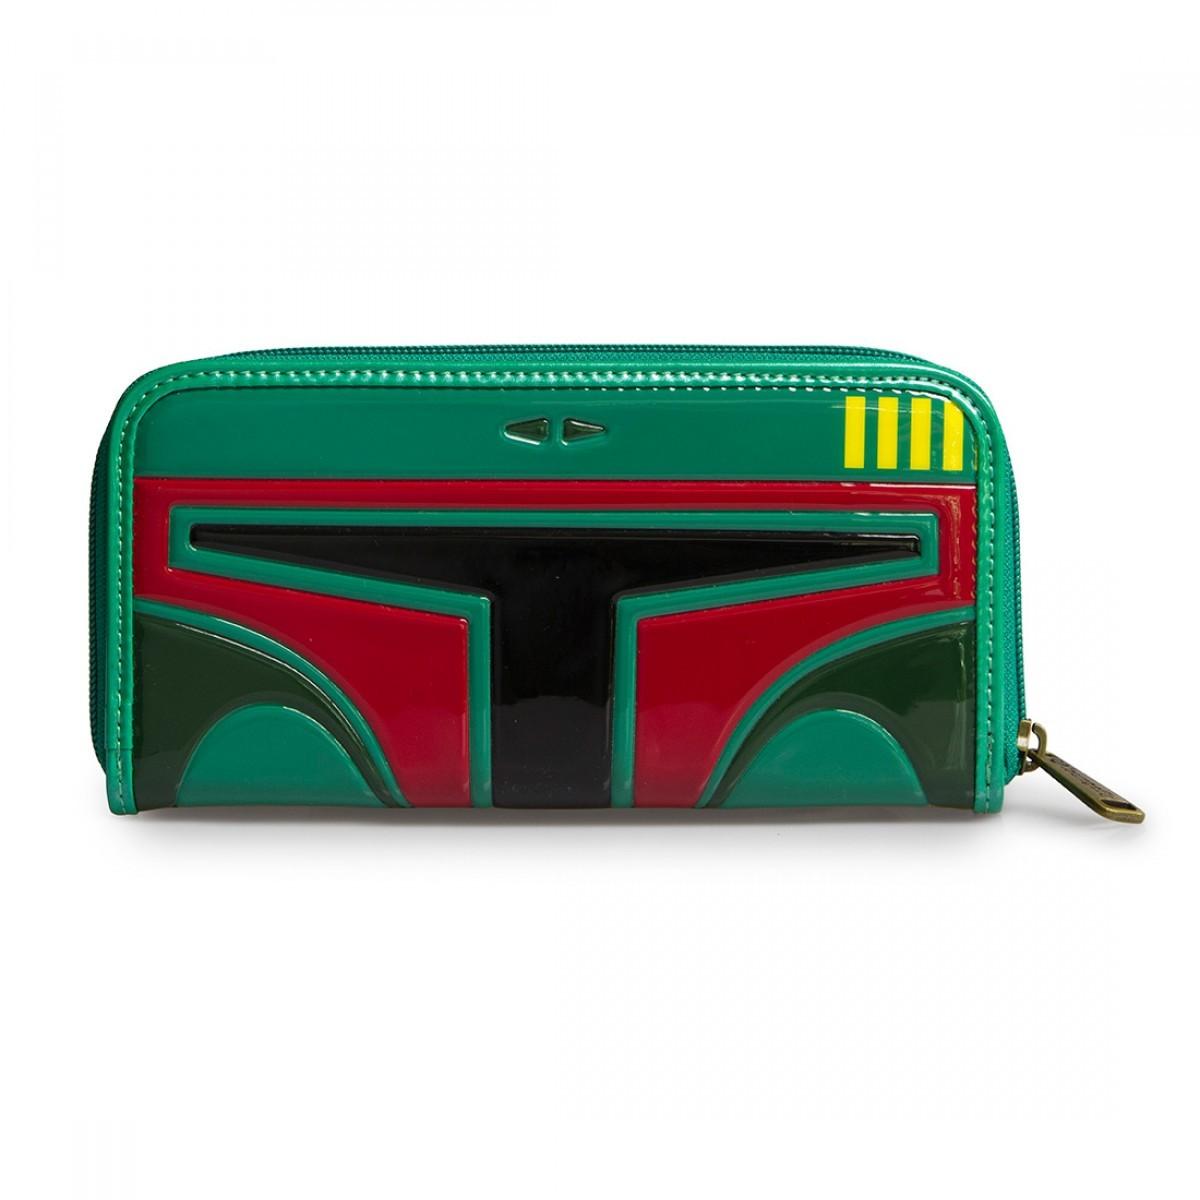 Loungefly: Star Wars Boba Fett Wallet image